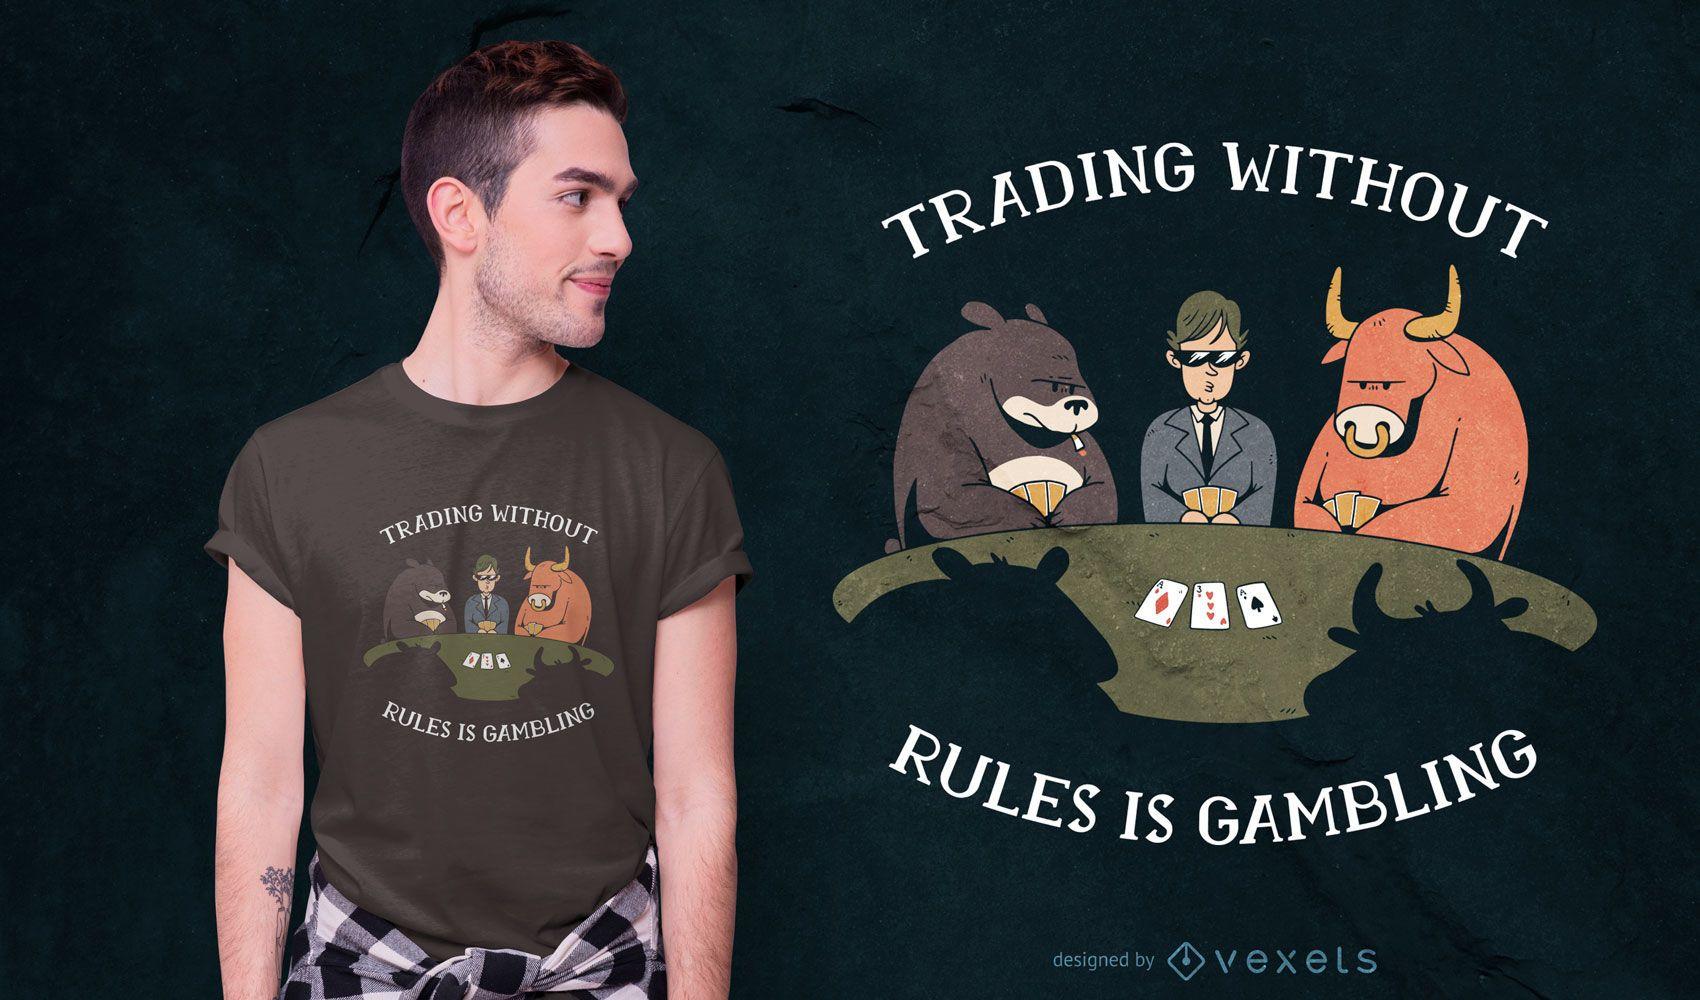 Poker gambling quote t-shirt design